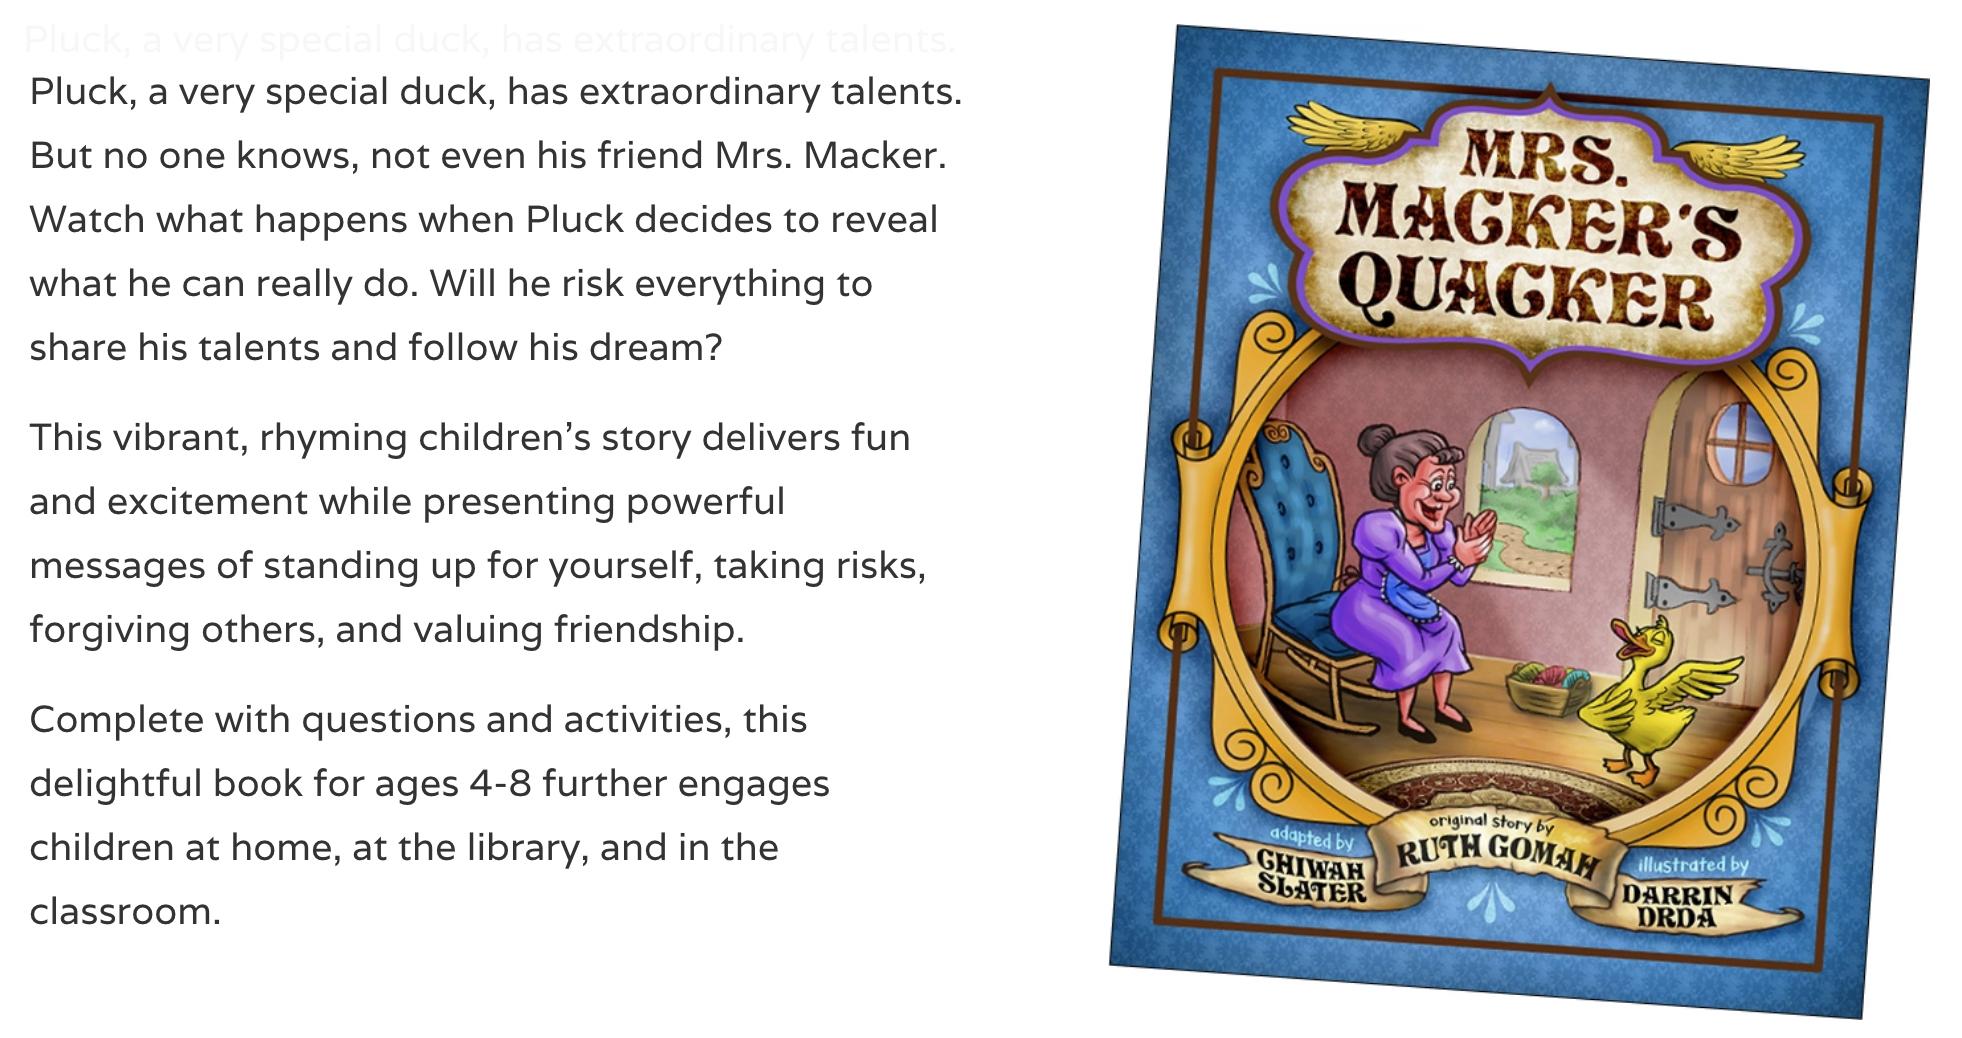 Mrs. Macker's Quacker, children's book front cover with book description